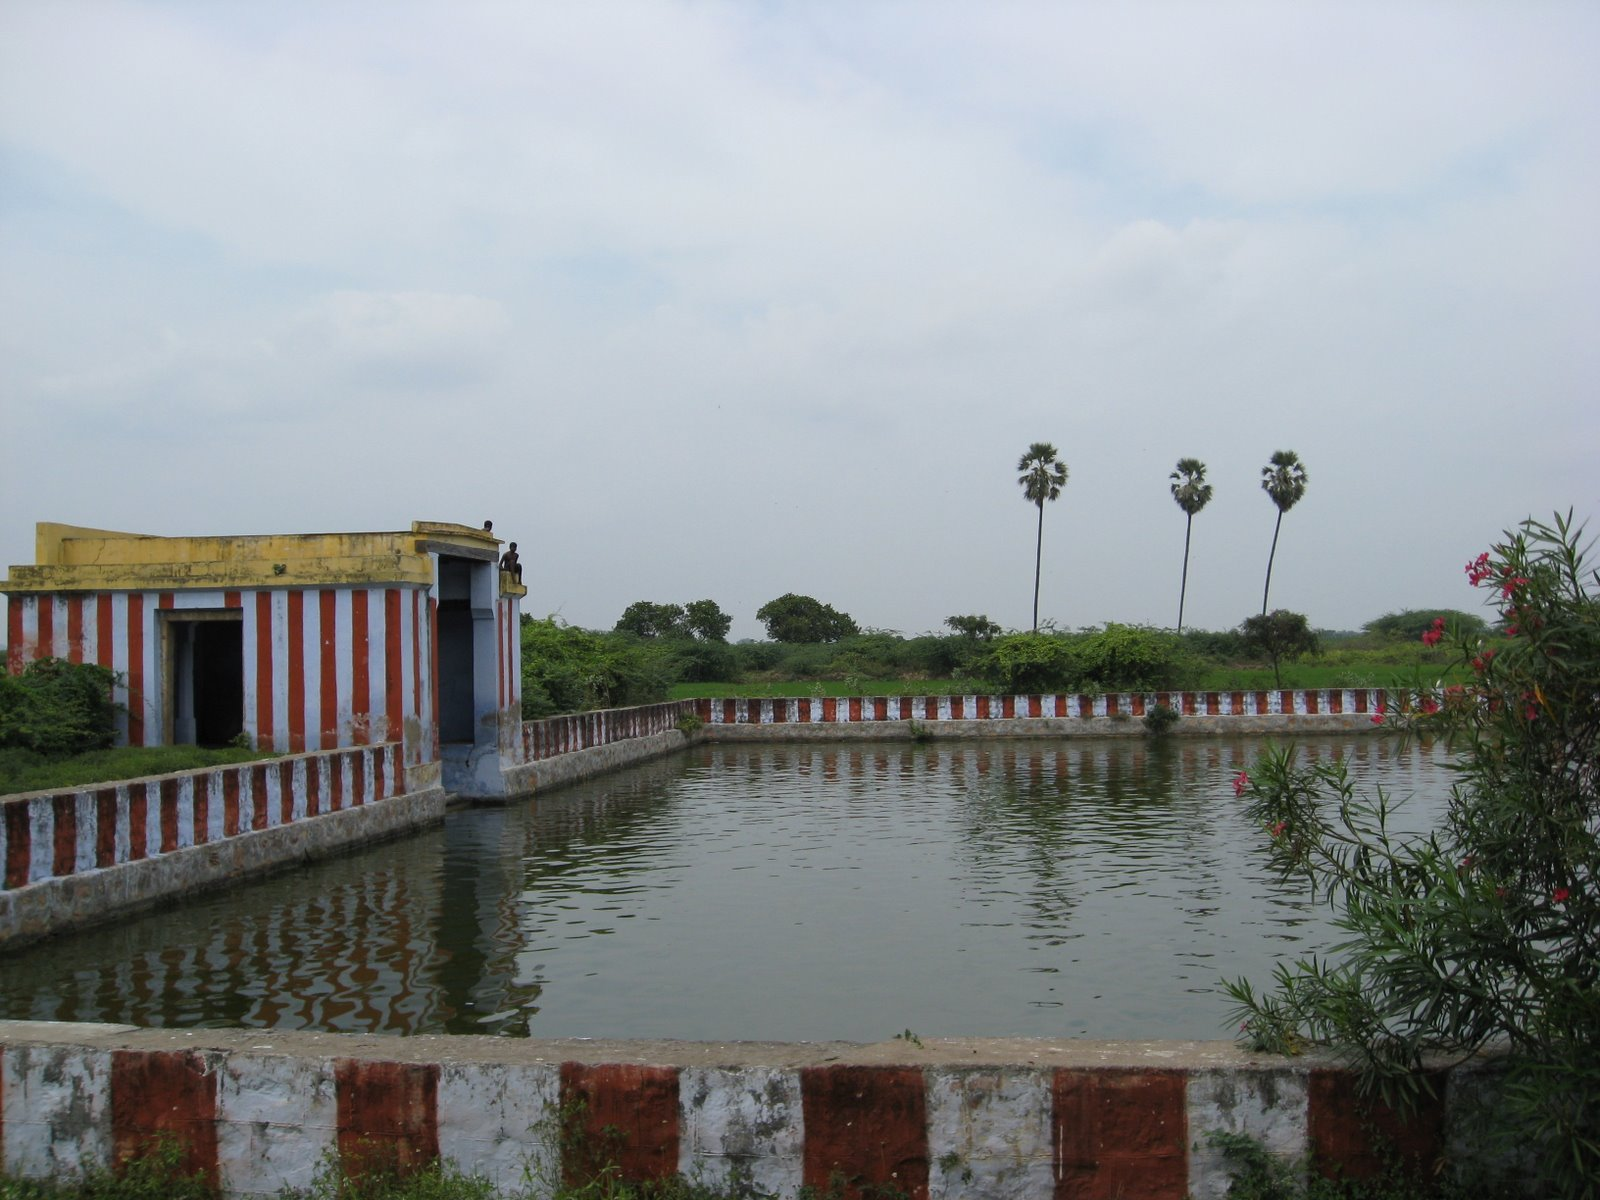 Sri Kaisina Vendhan Perumal - Thiru Puliangudi, Nava Tirupathi - Nine Holy Temples